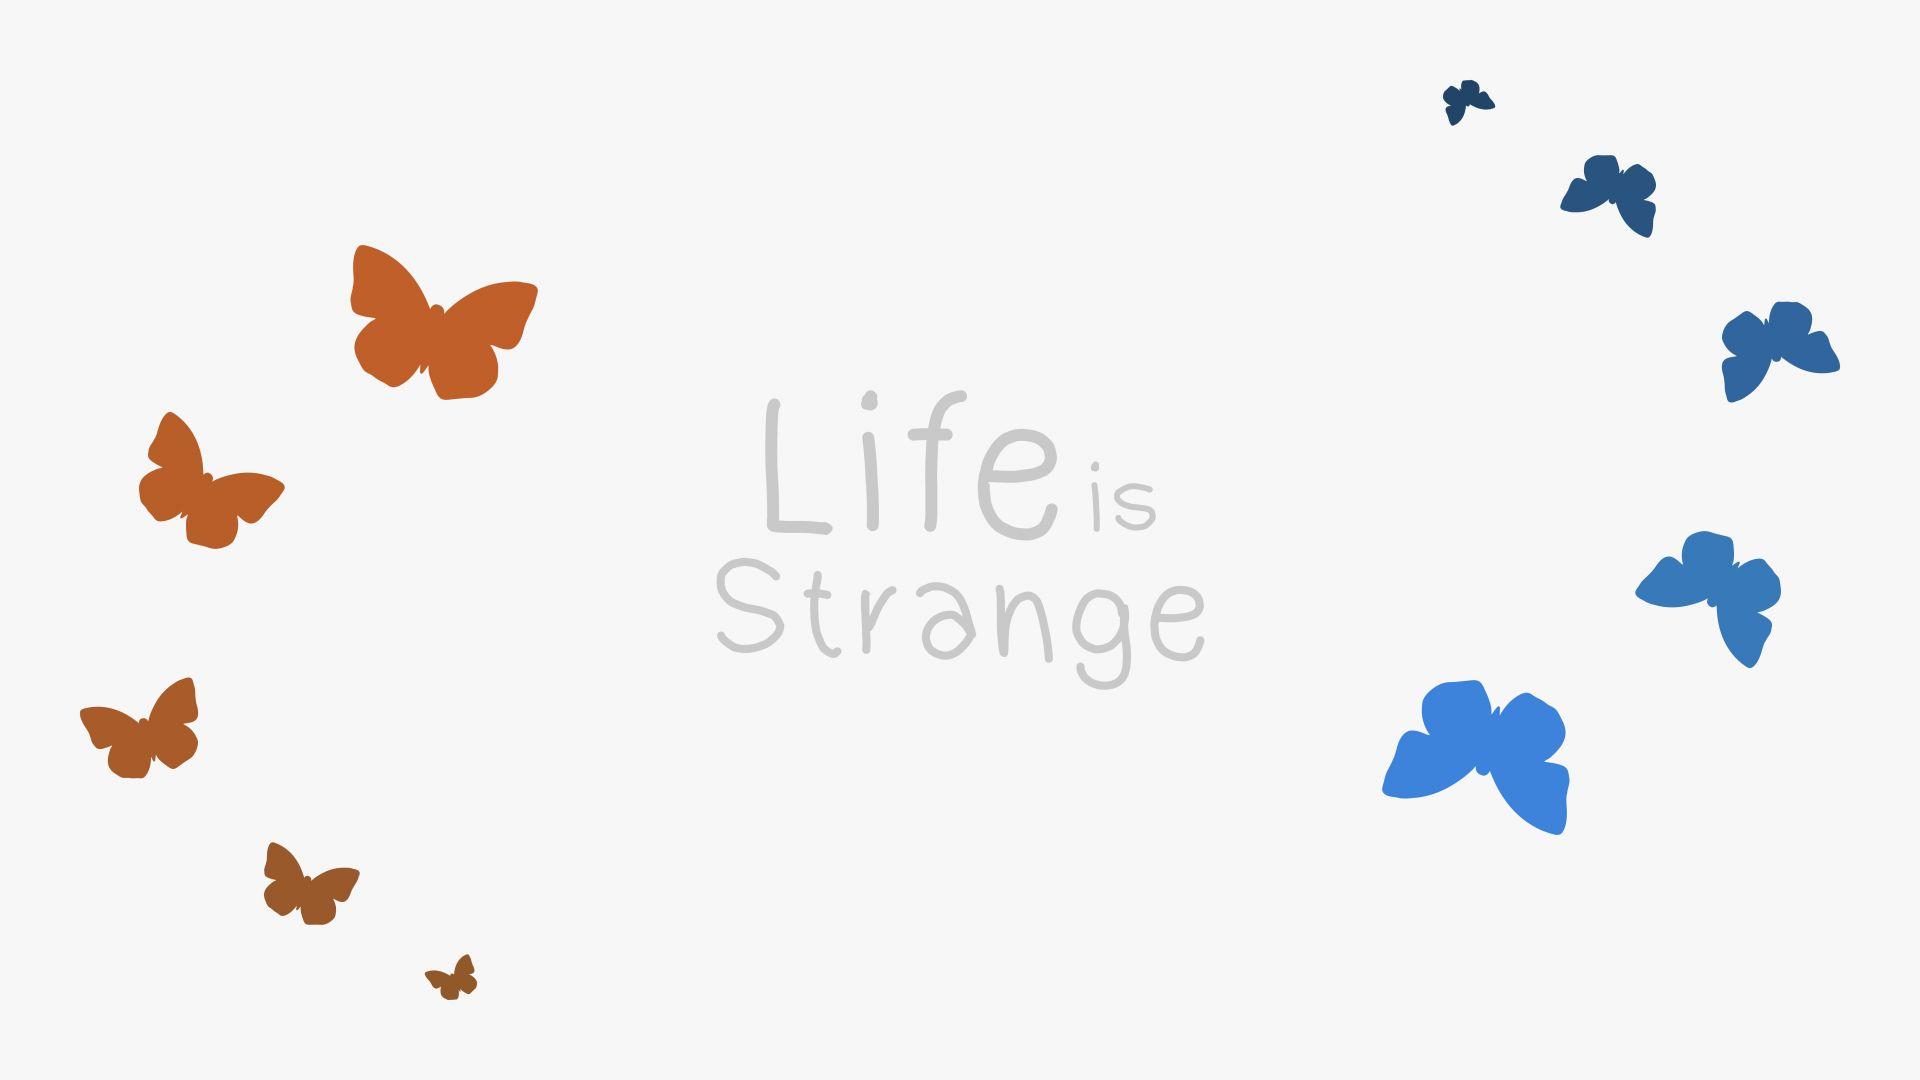 Wallpaper Life is strange, typography, minimal